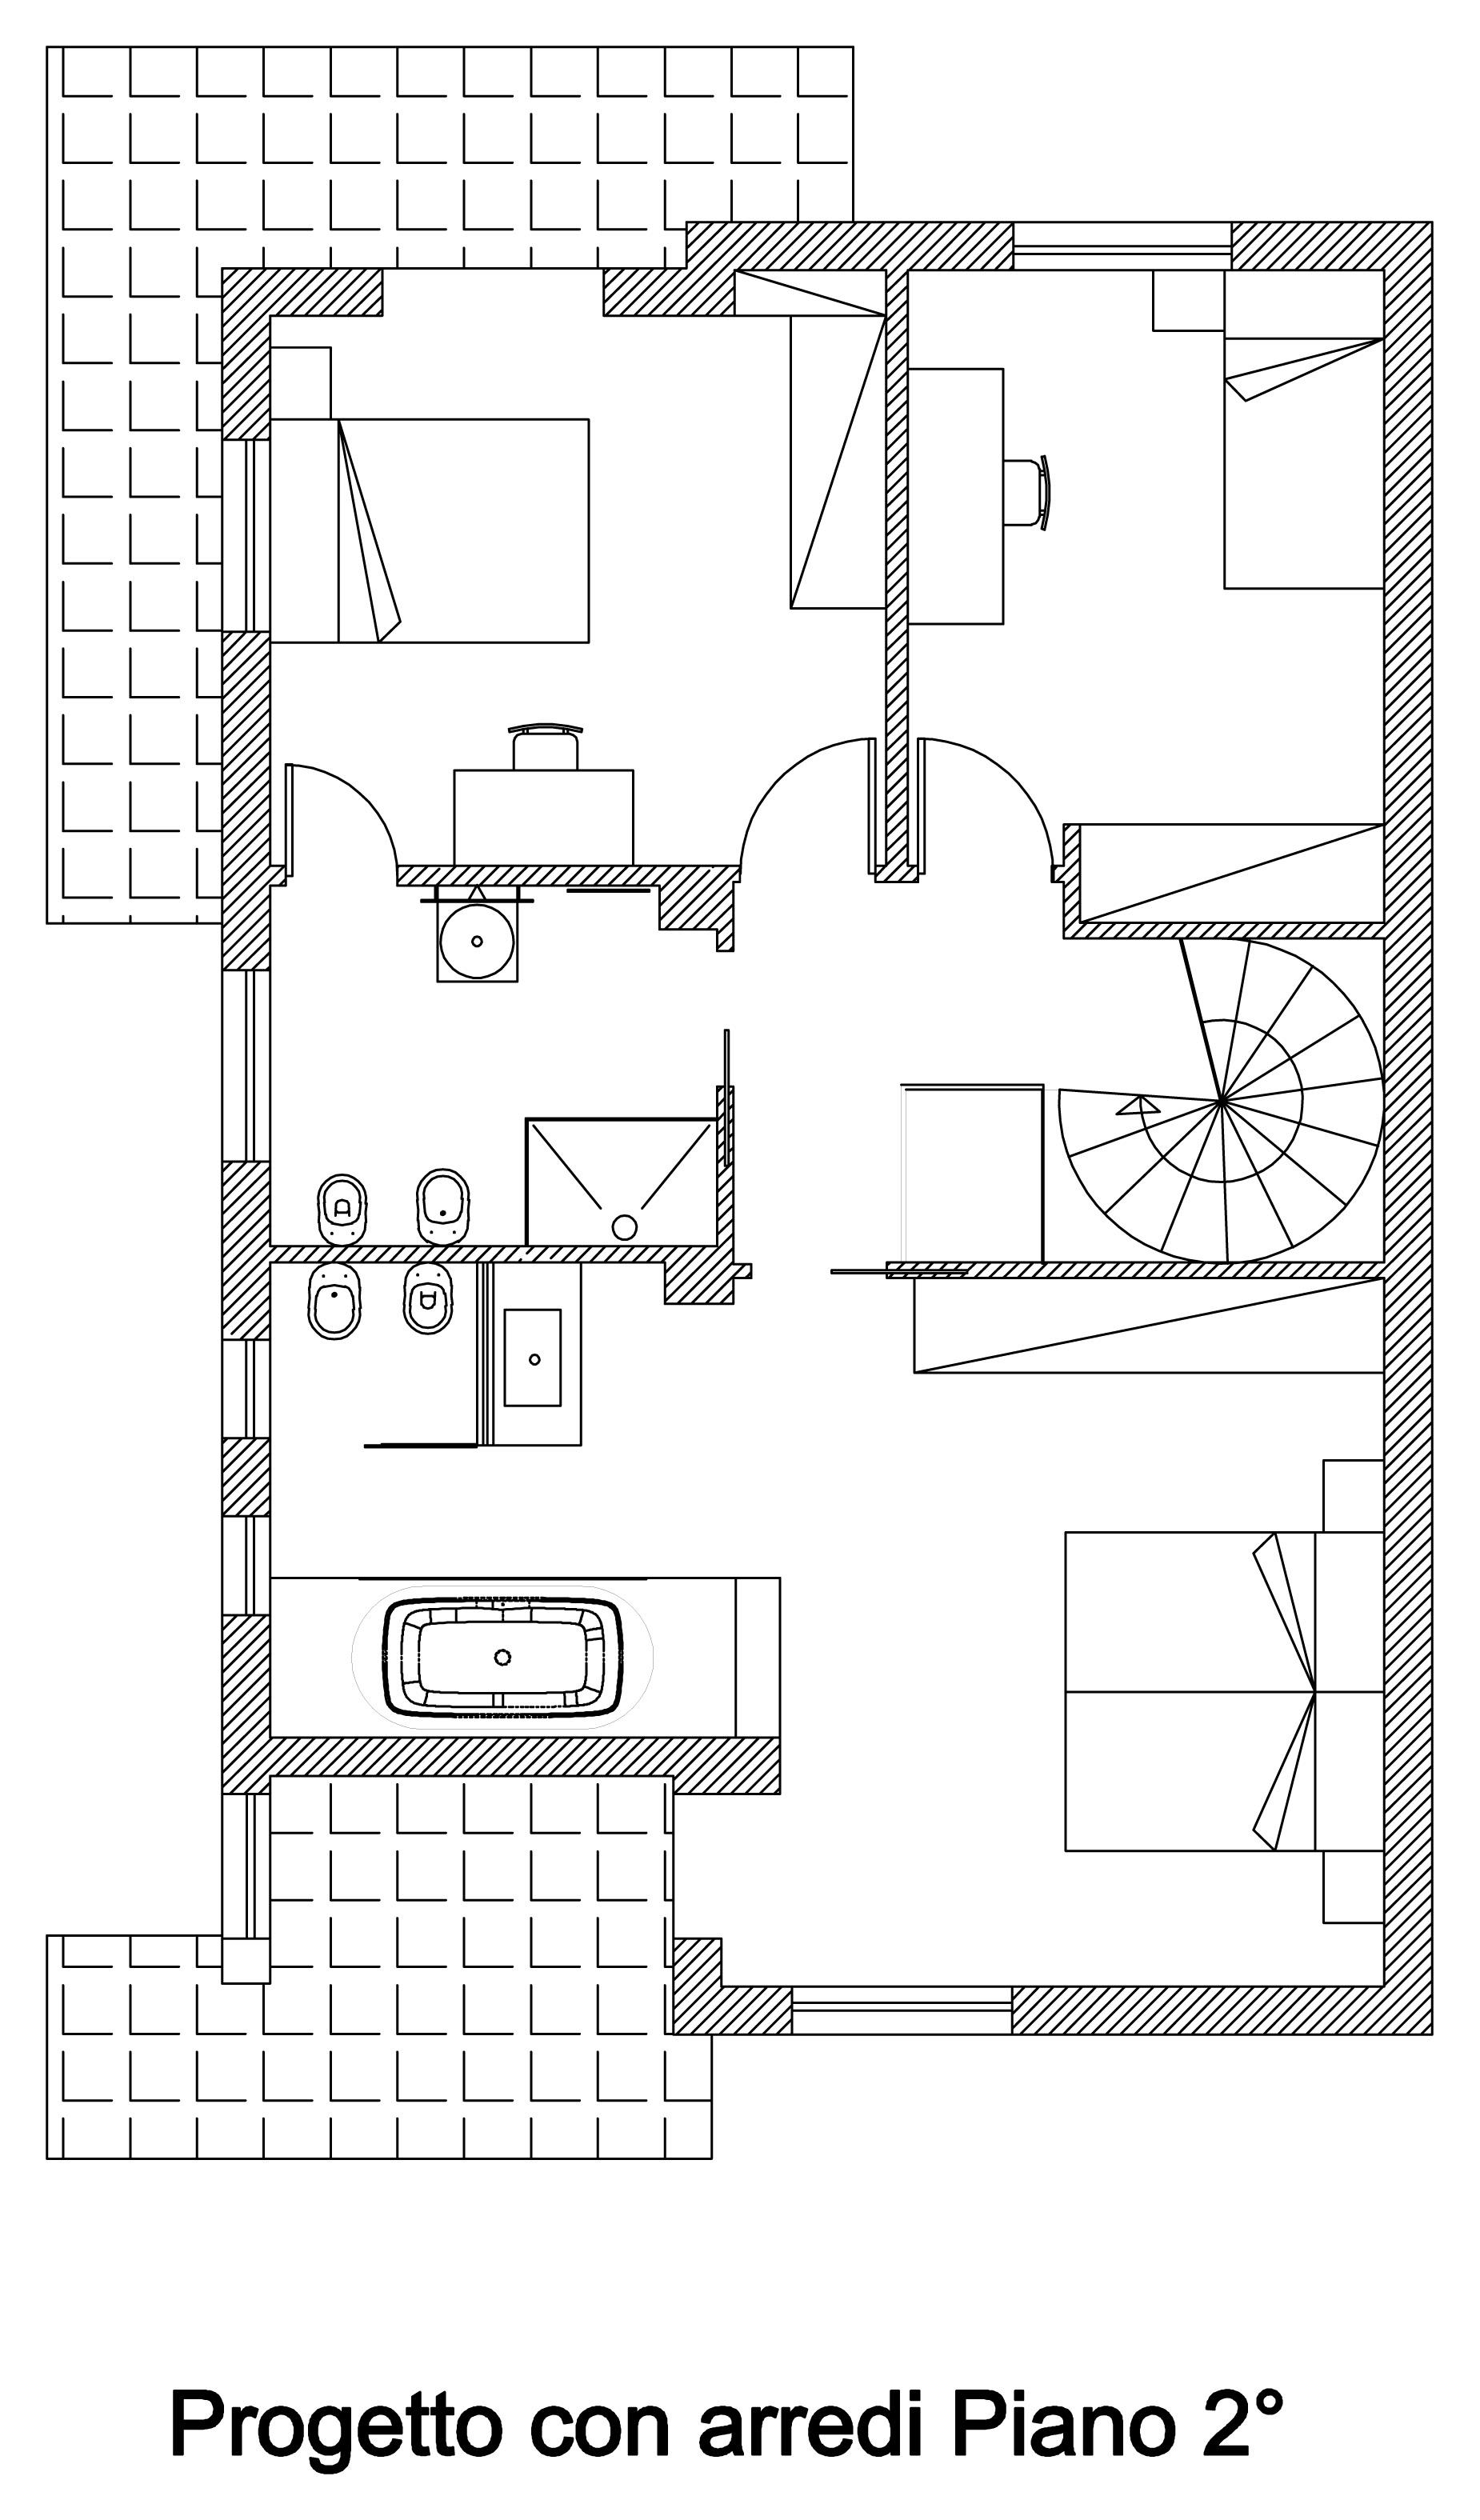 arch-arnone-interior-design-of-unabitazione-of-2-levels-floor-seconds